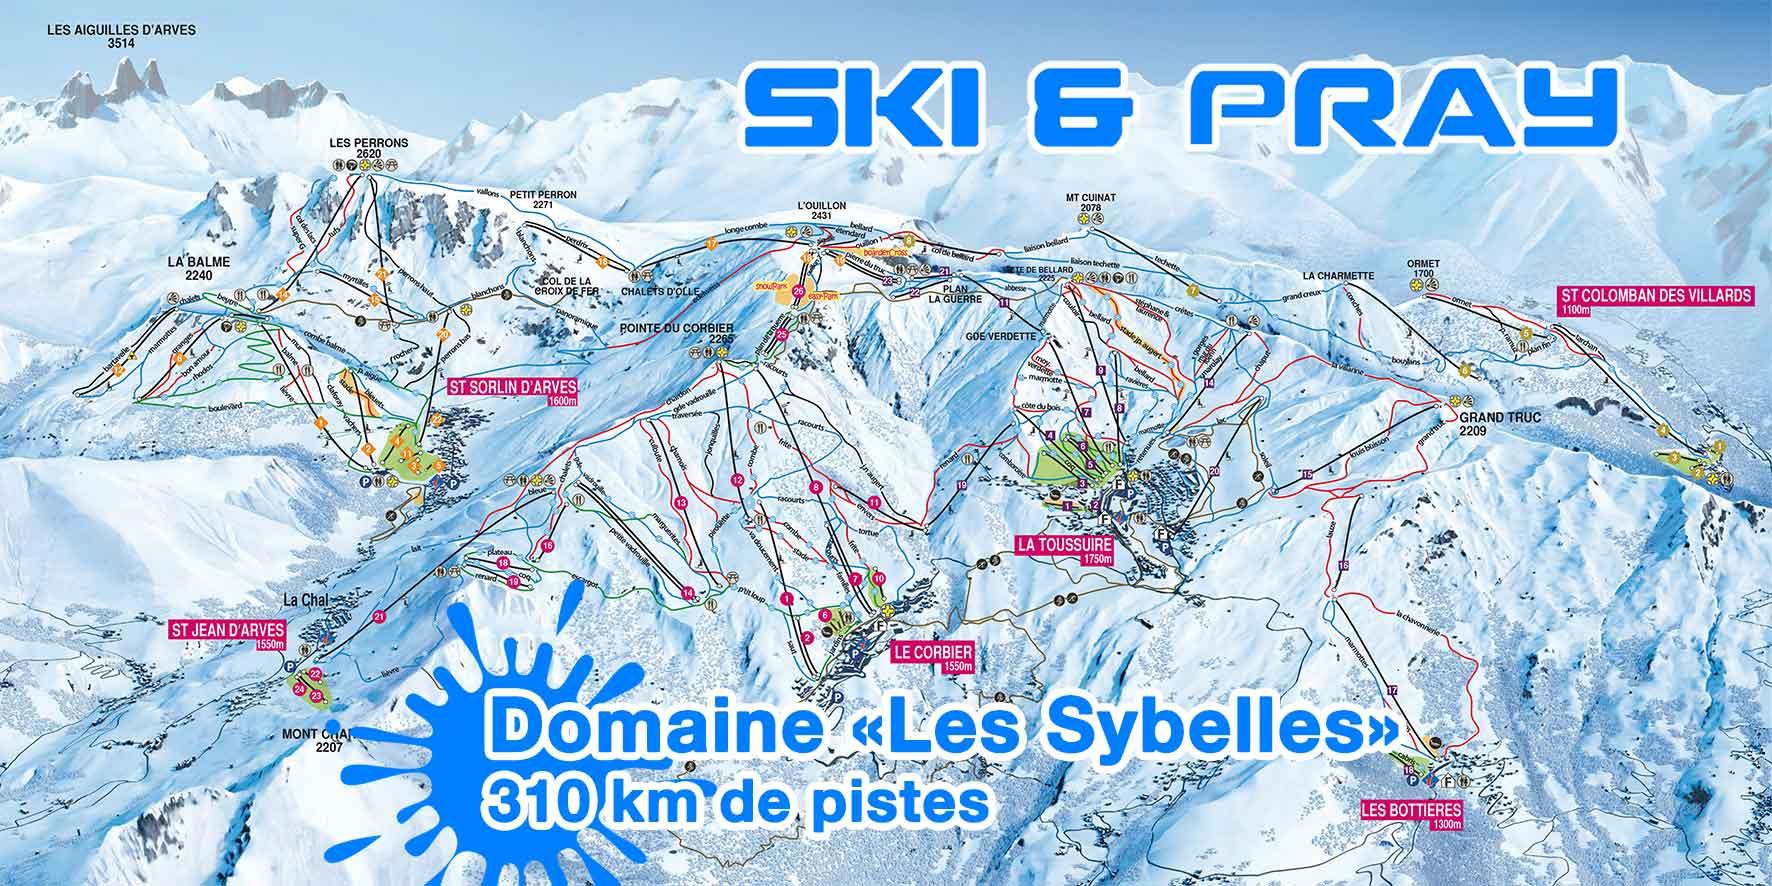 skiandpray-lessybelles-plan_des_pistes_2016-17-web